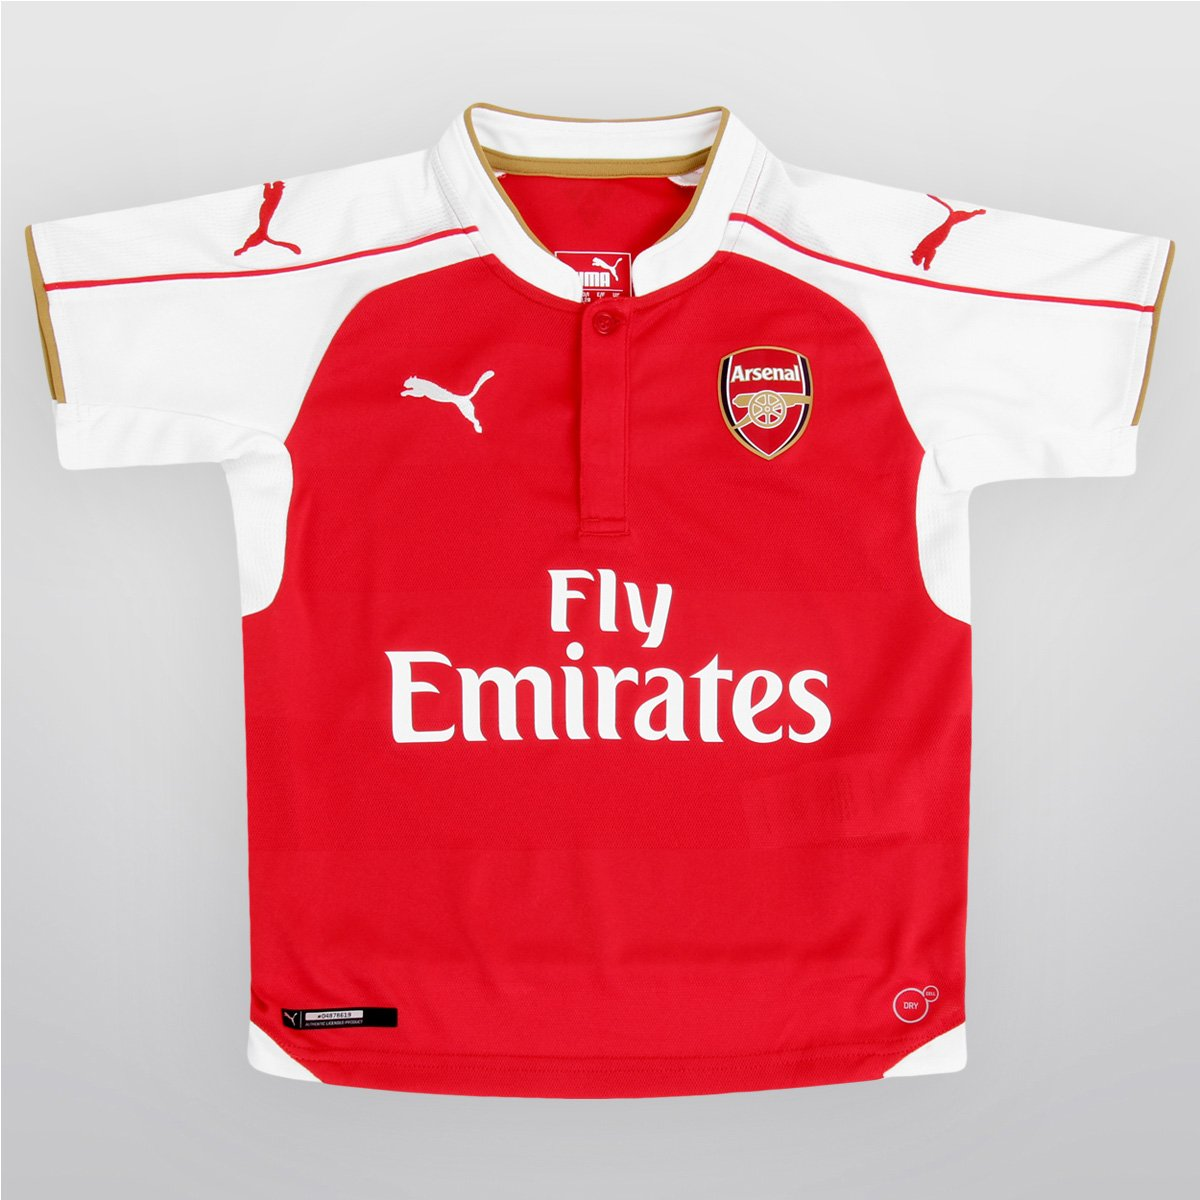 391503b78b682 Camisa Puma Arsenal Home 15 16 s nº Juvenil - Compre Agora